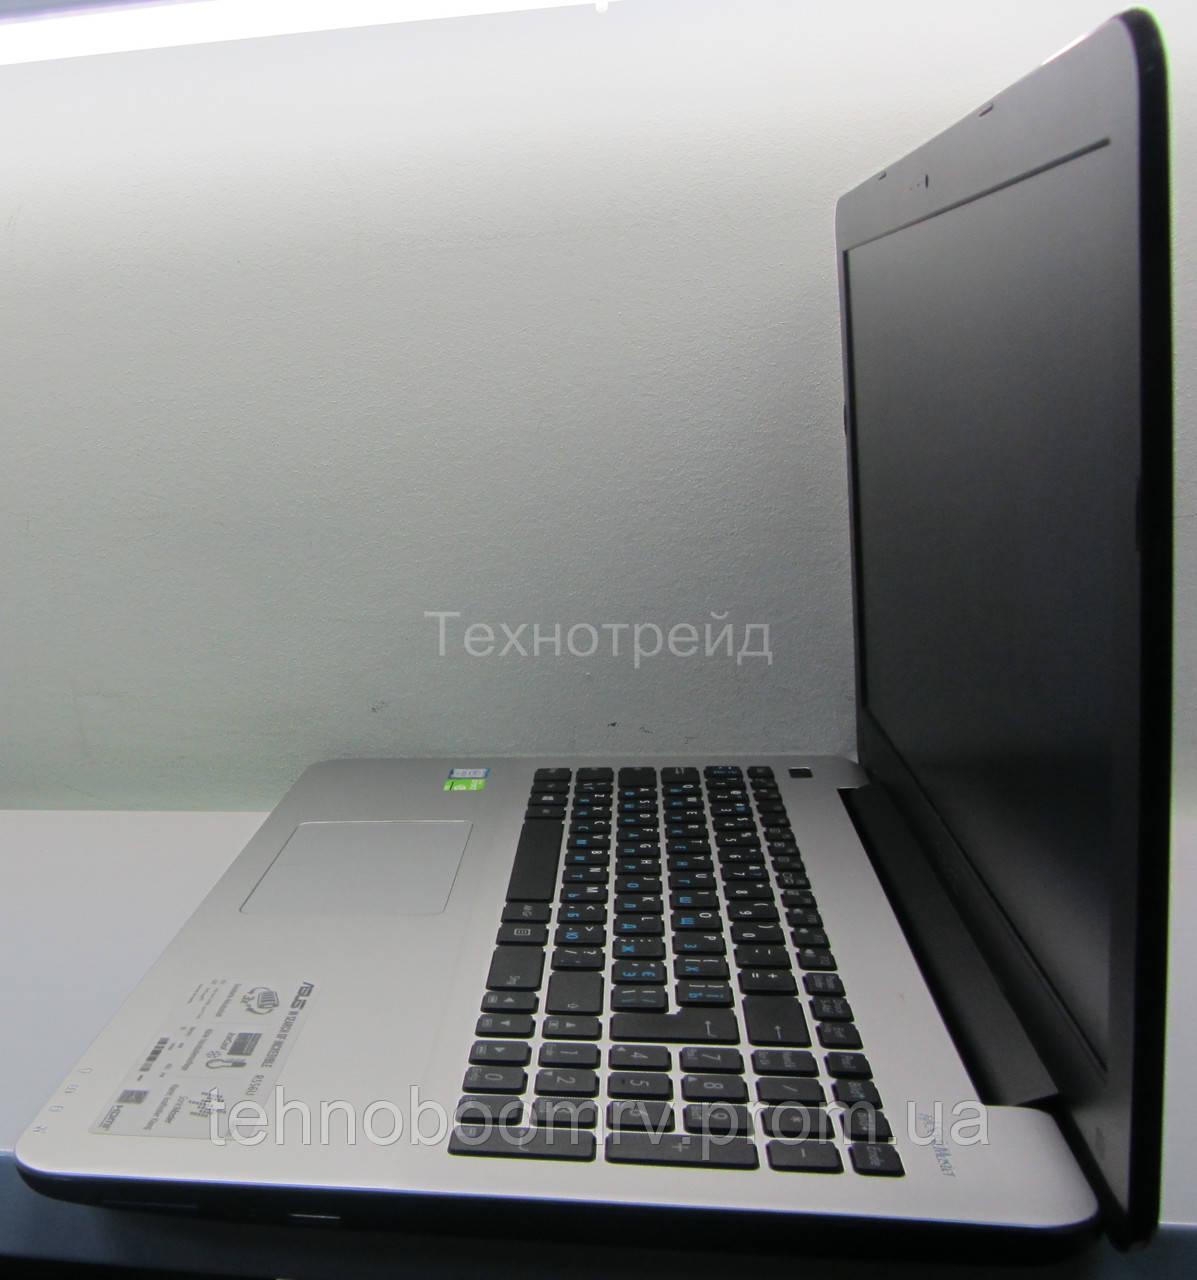 Asus R556U - Intel i7-6500U 3.1GHz/DDR3 8GB/nVidia GT 940M 2GB 4